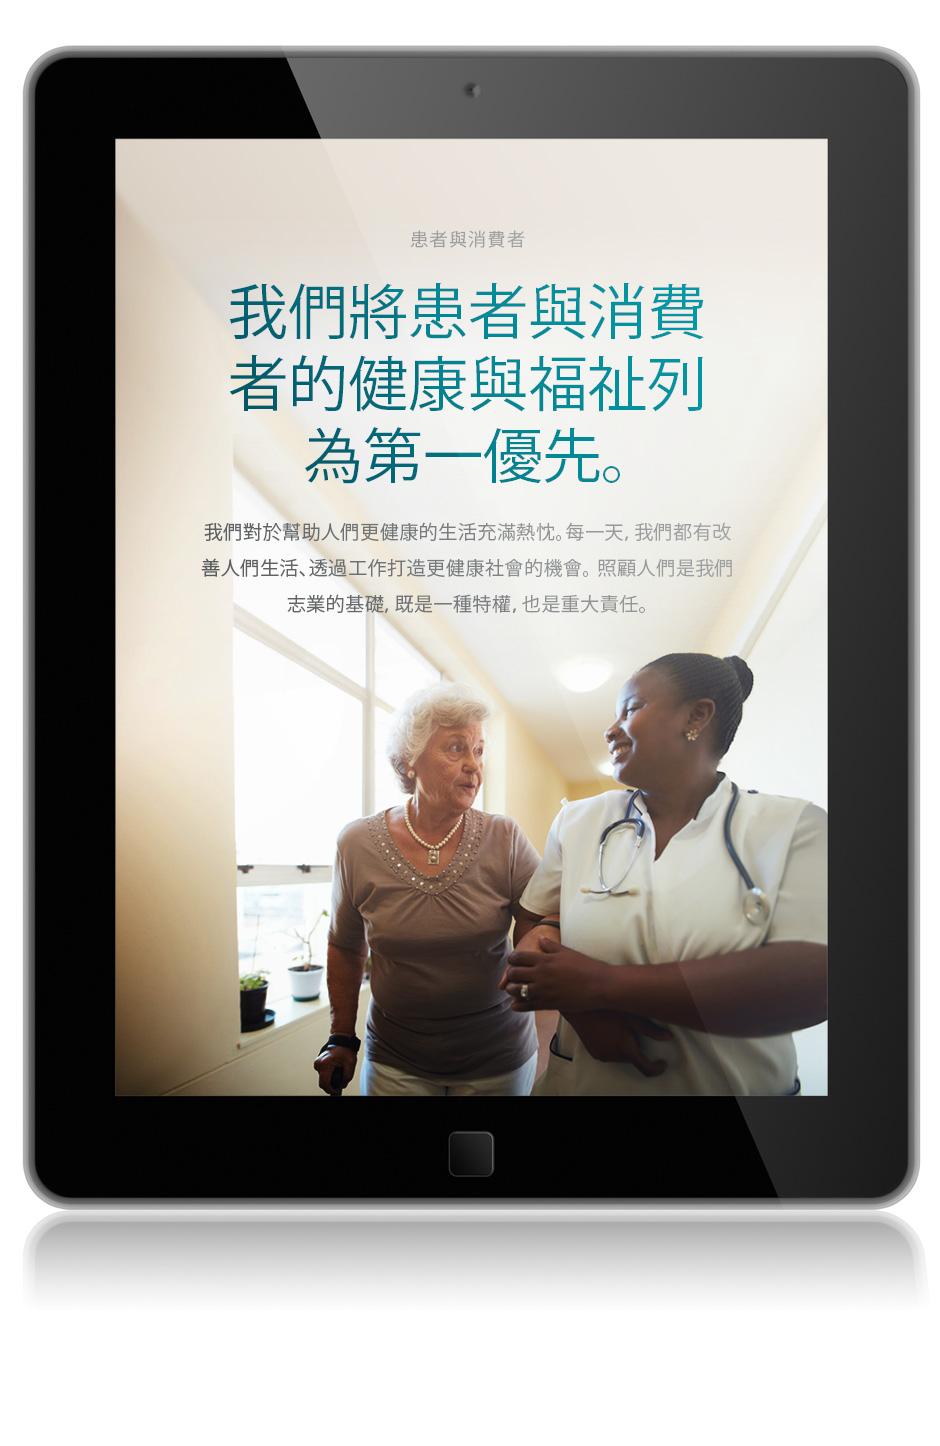 OurWork_Train75k_iPad_Chinese.jpg